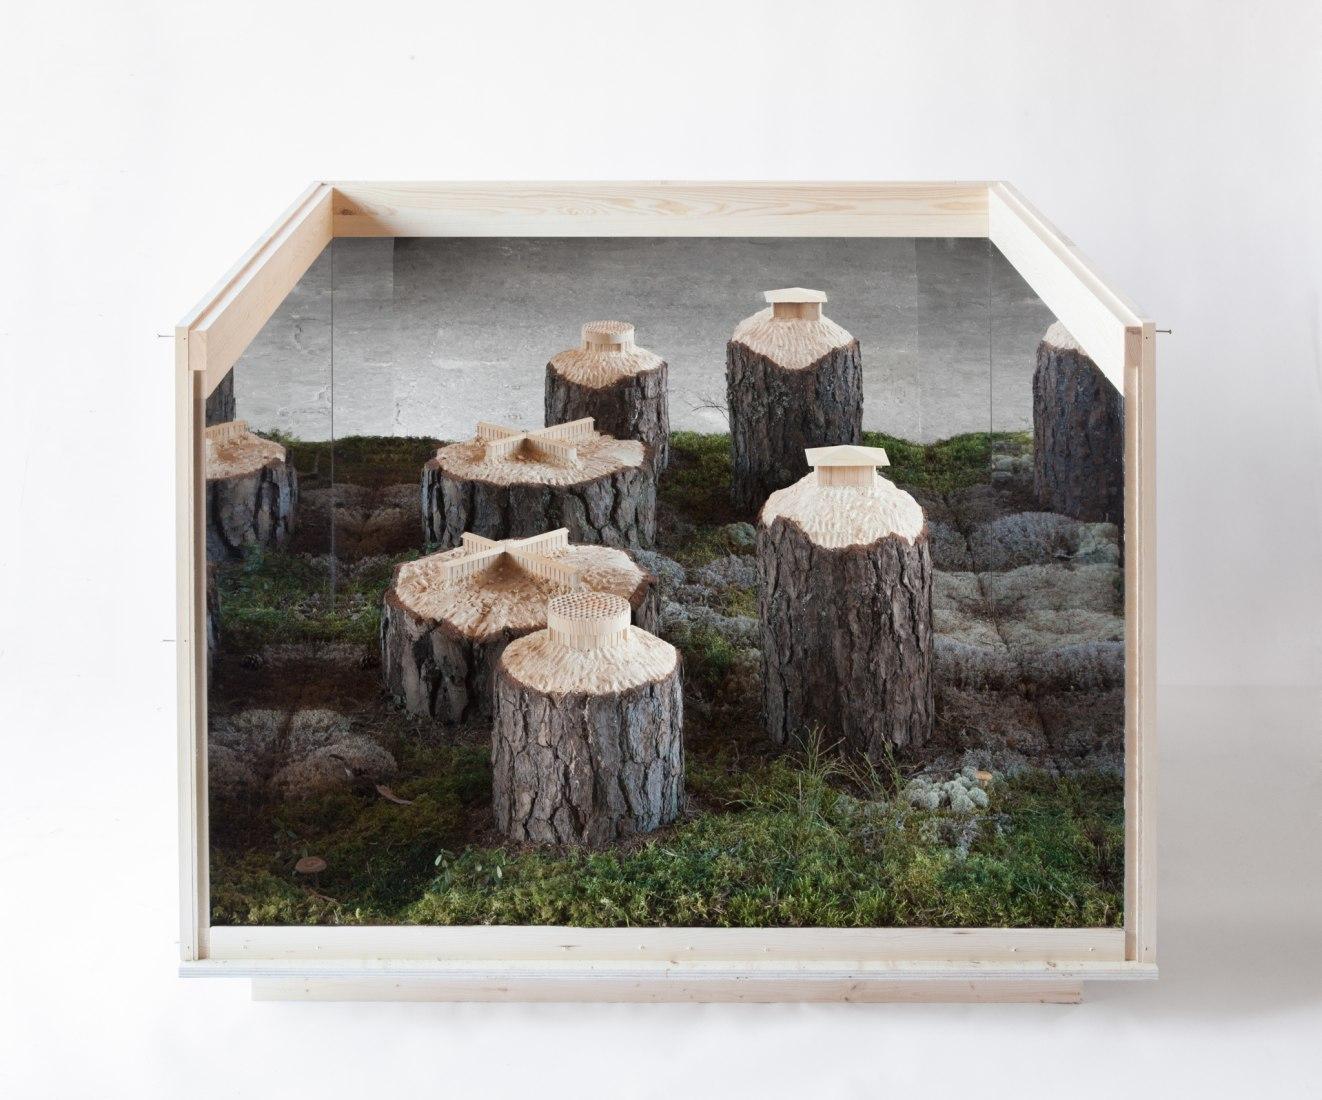 'The Naturalis Brutalis' de Krupinski / Krupinska Arkitekter en la Bienal de Arquitectura de Venecia 2018. Fotografía por Victor Johansson